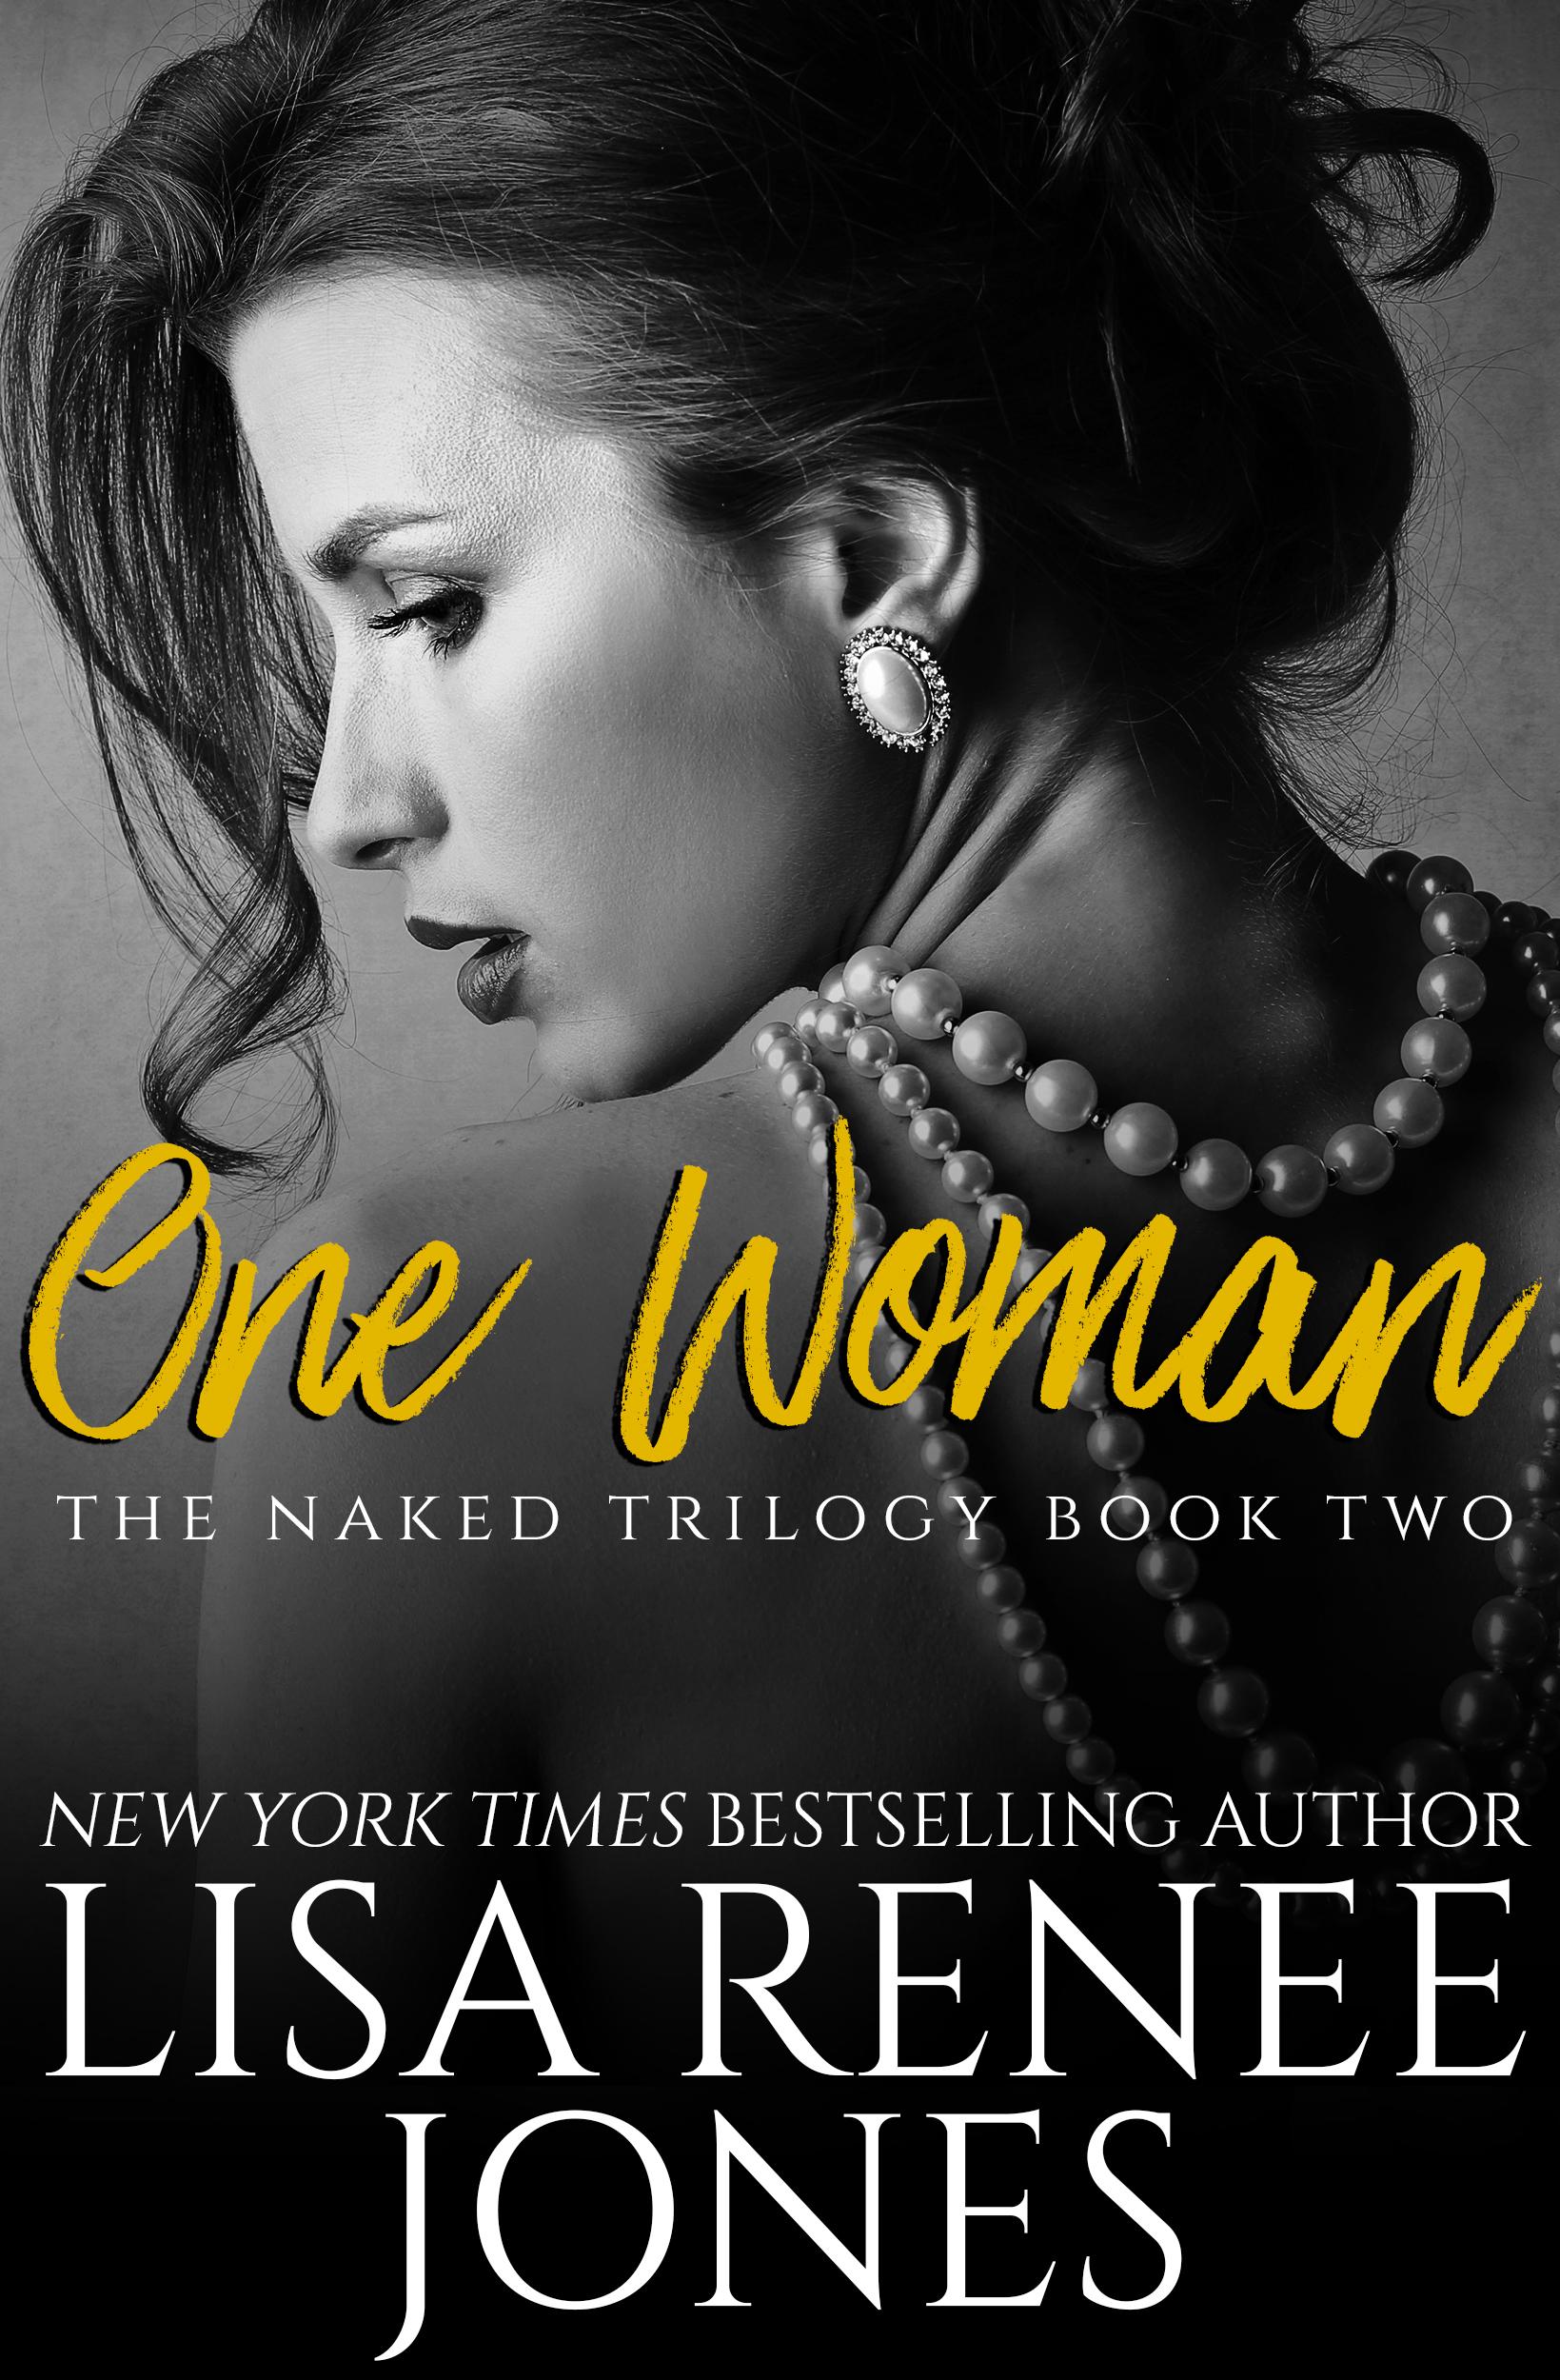 Lisa Renee Jones - Naked Trilogy 2 - One Woman